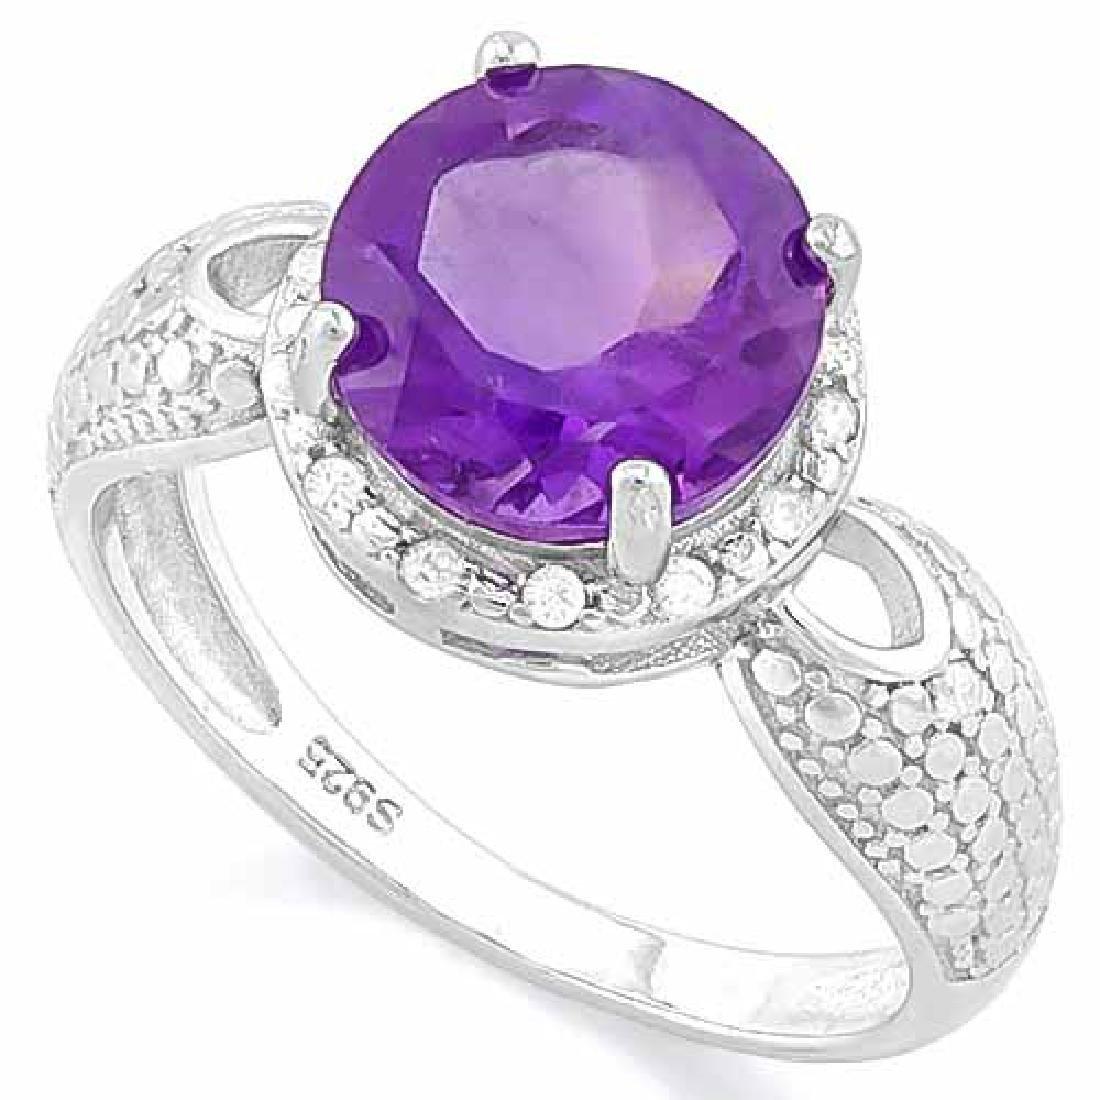 2 1/2 CARAT AMETHYST & DIAMOND 925 STERLING SILVER RING